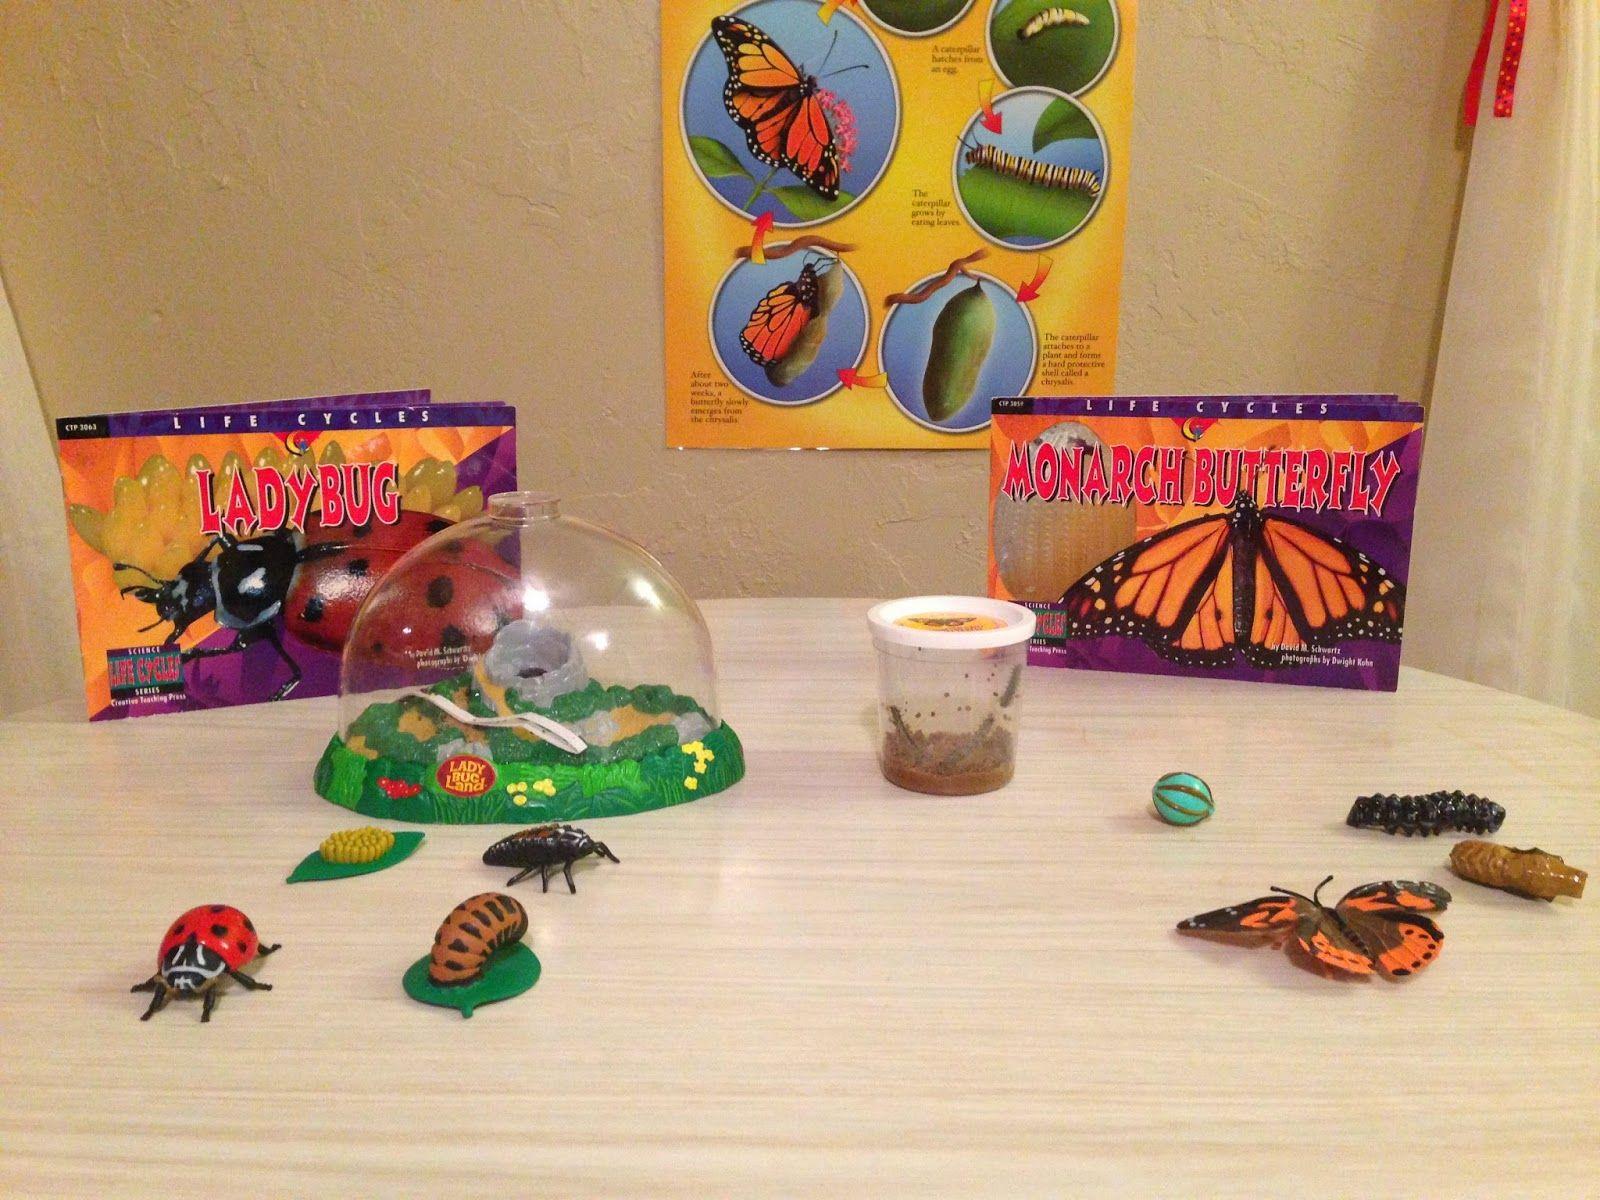 Caterpillars And Ladybugs